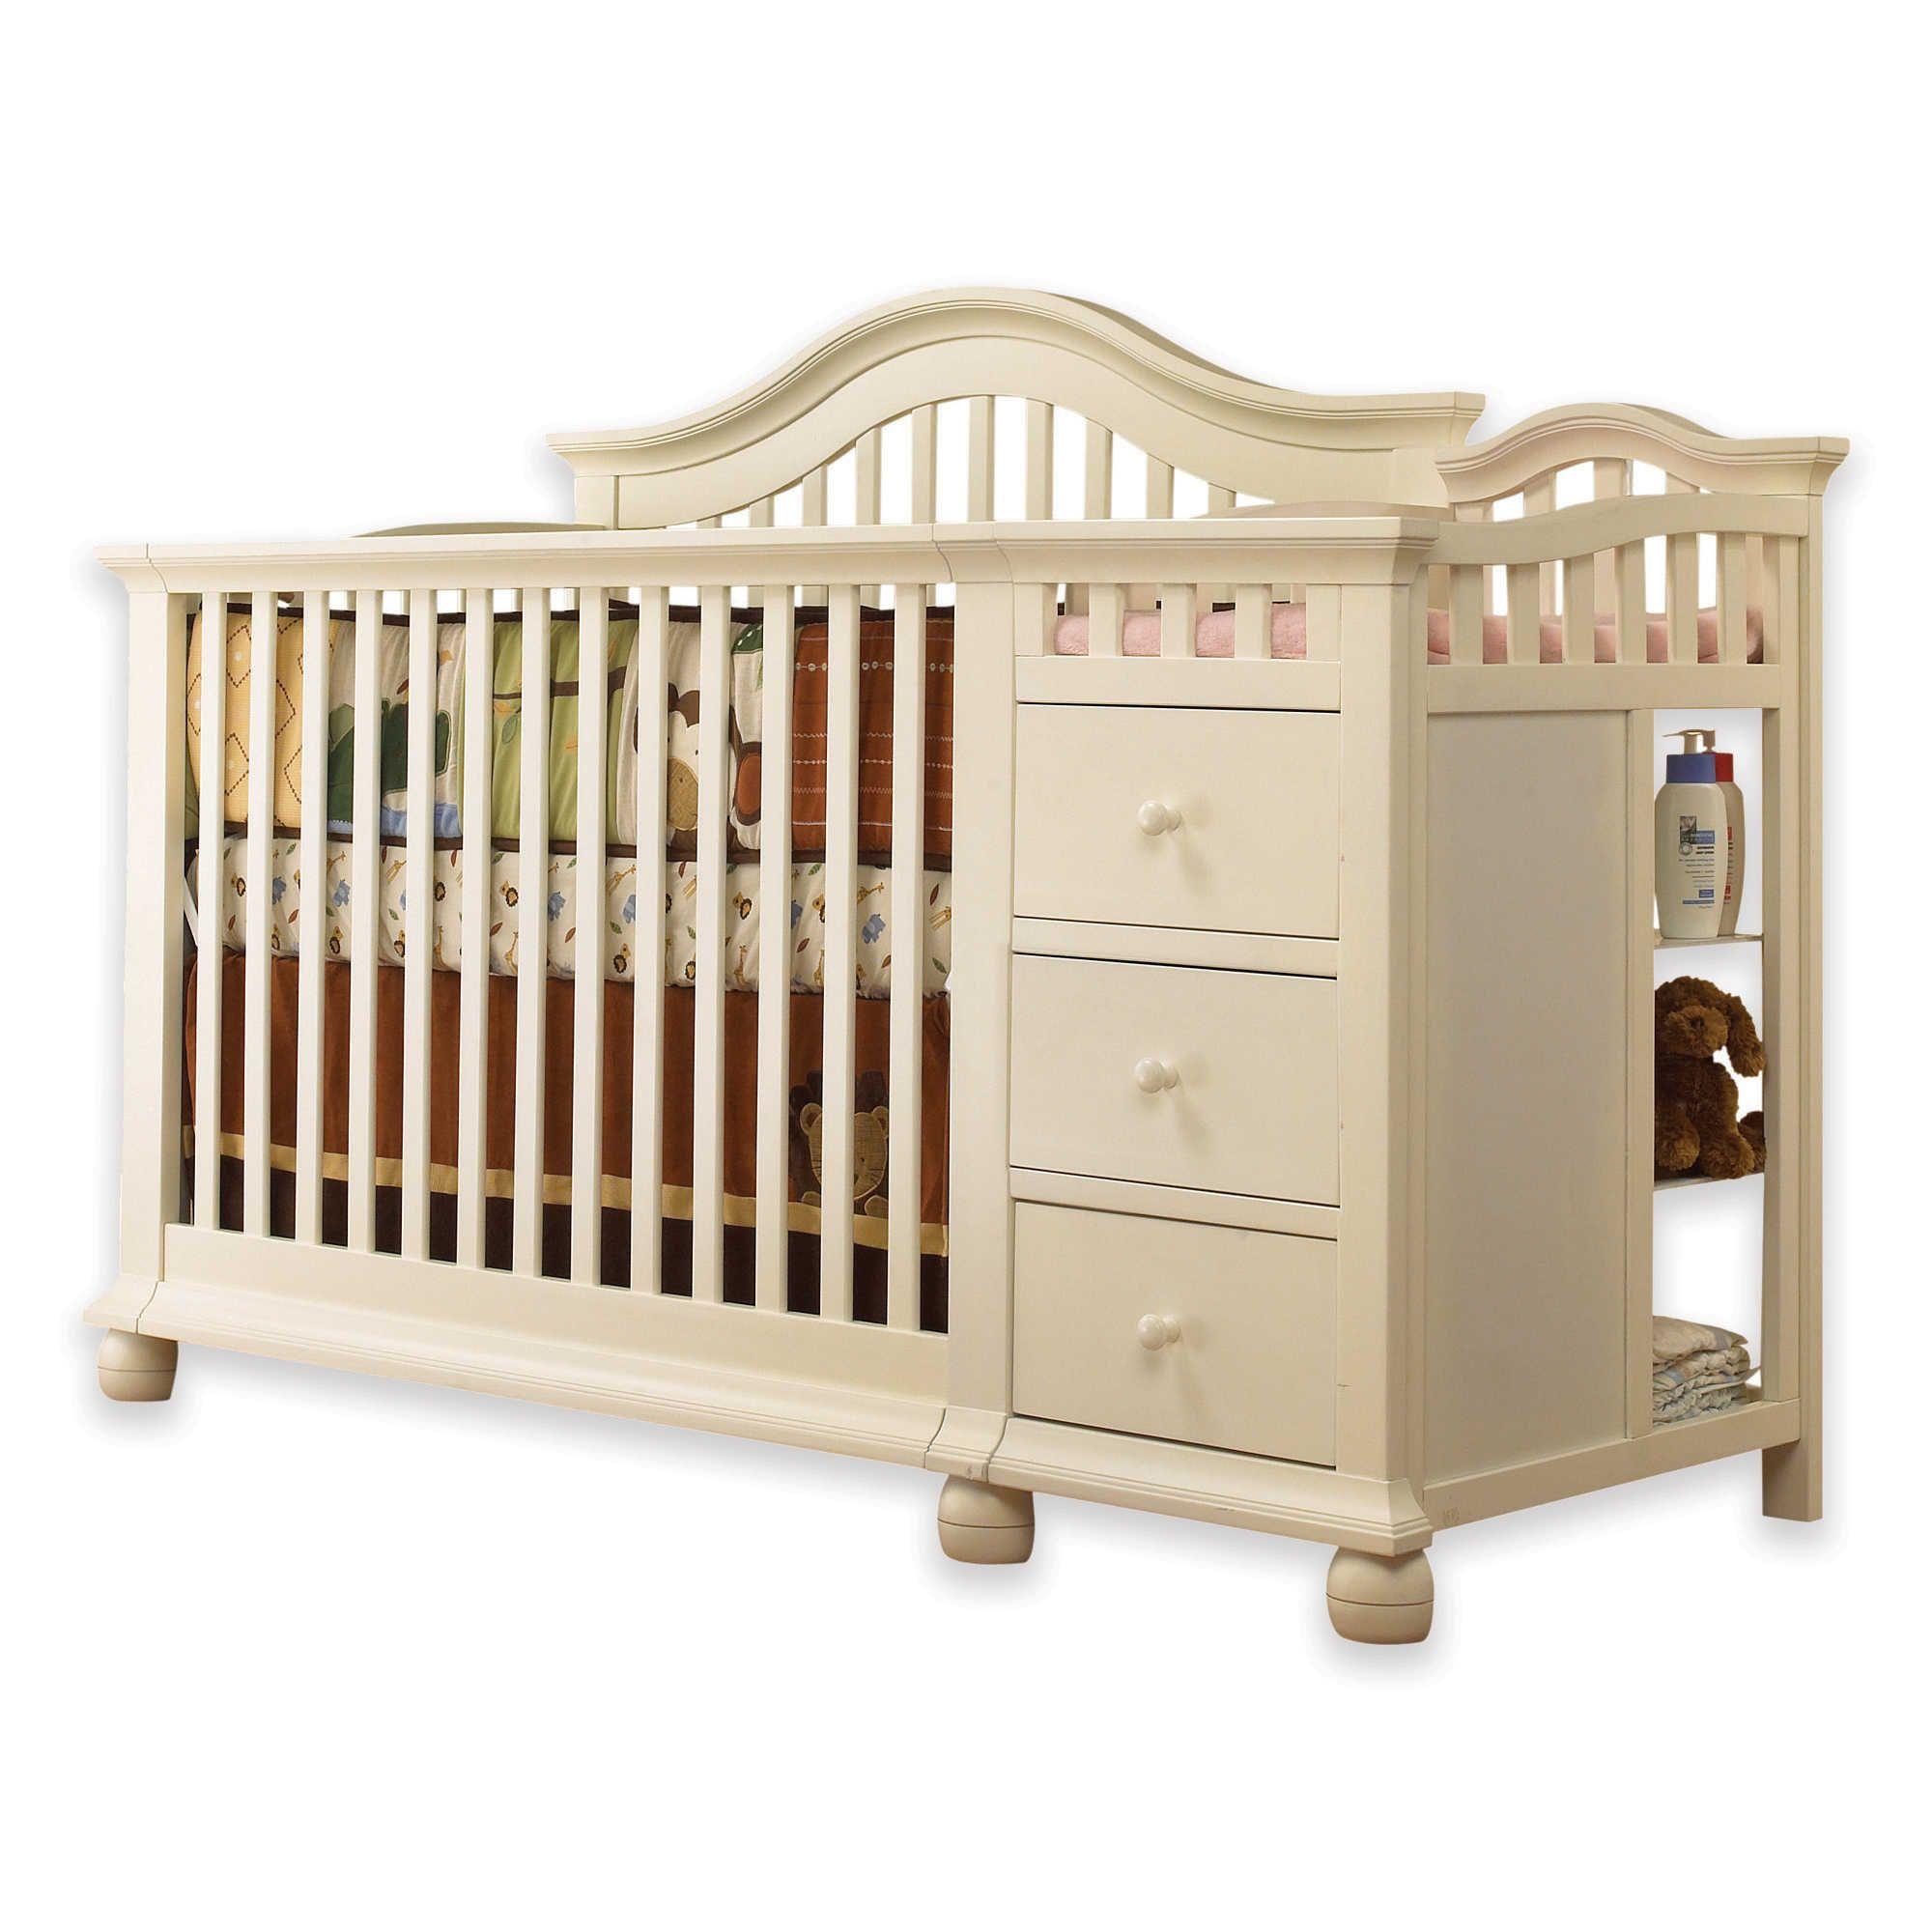 delta canton crib providence sleigh cribs infomasif convertible quicksoluction elegant angle home in bentley